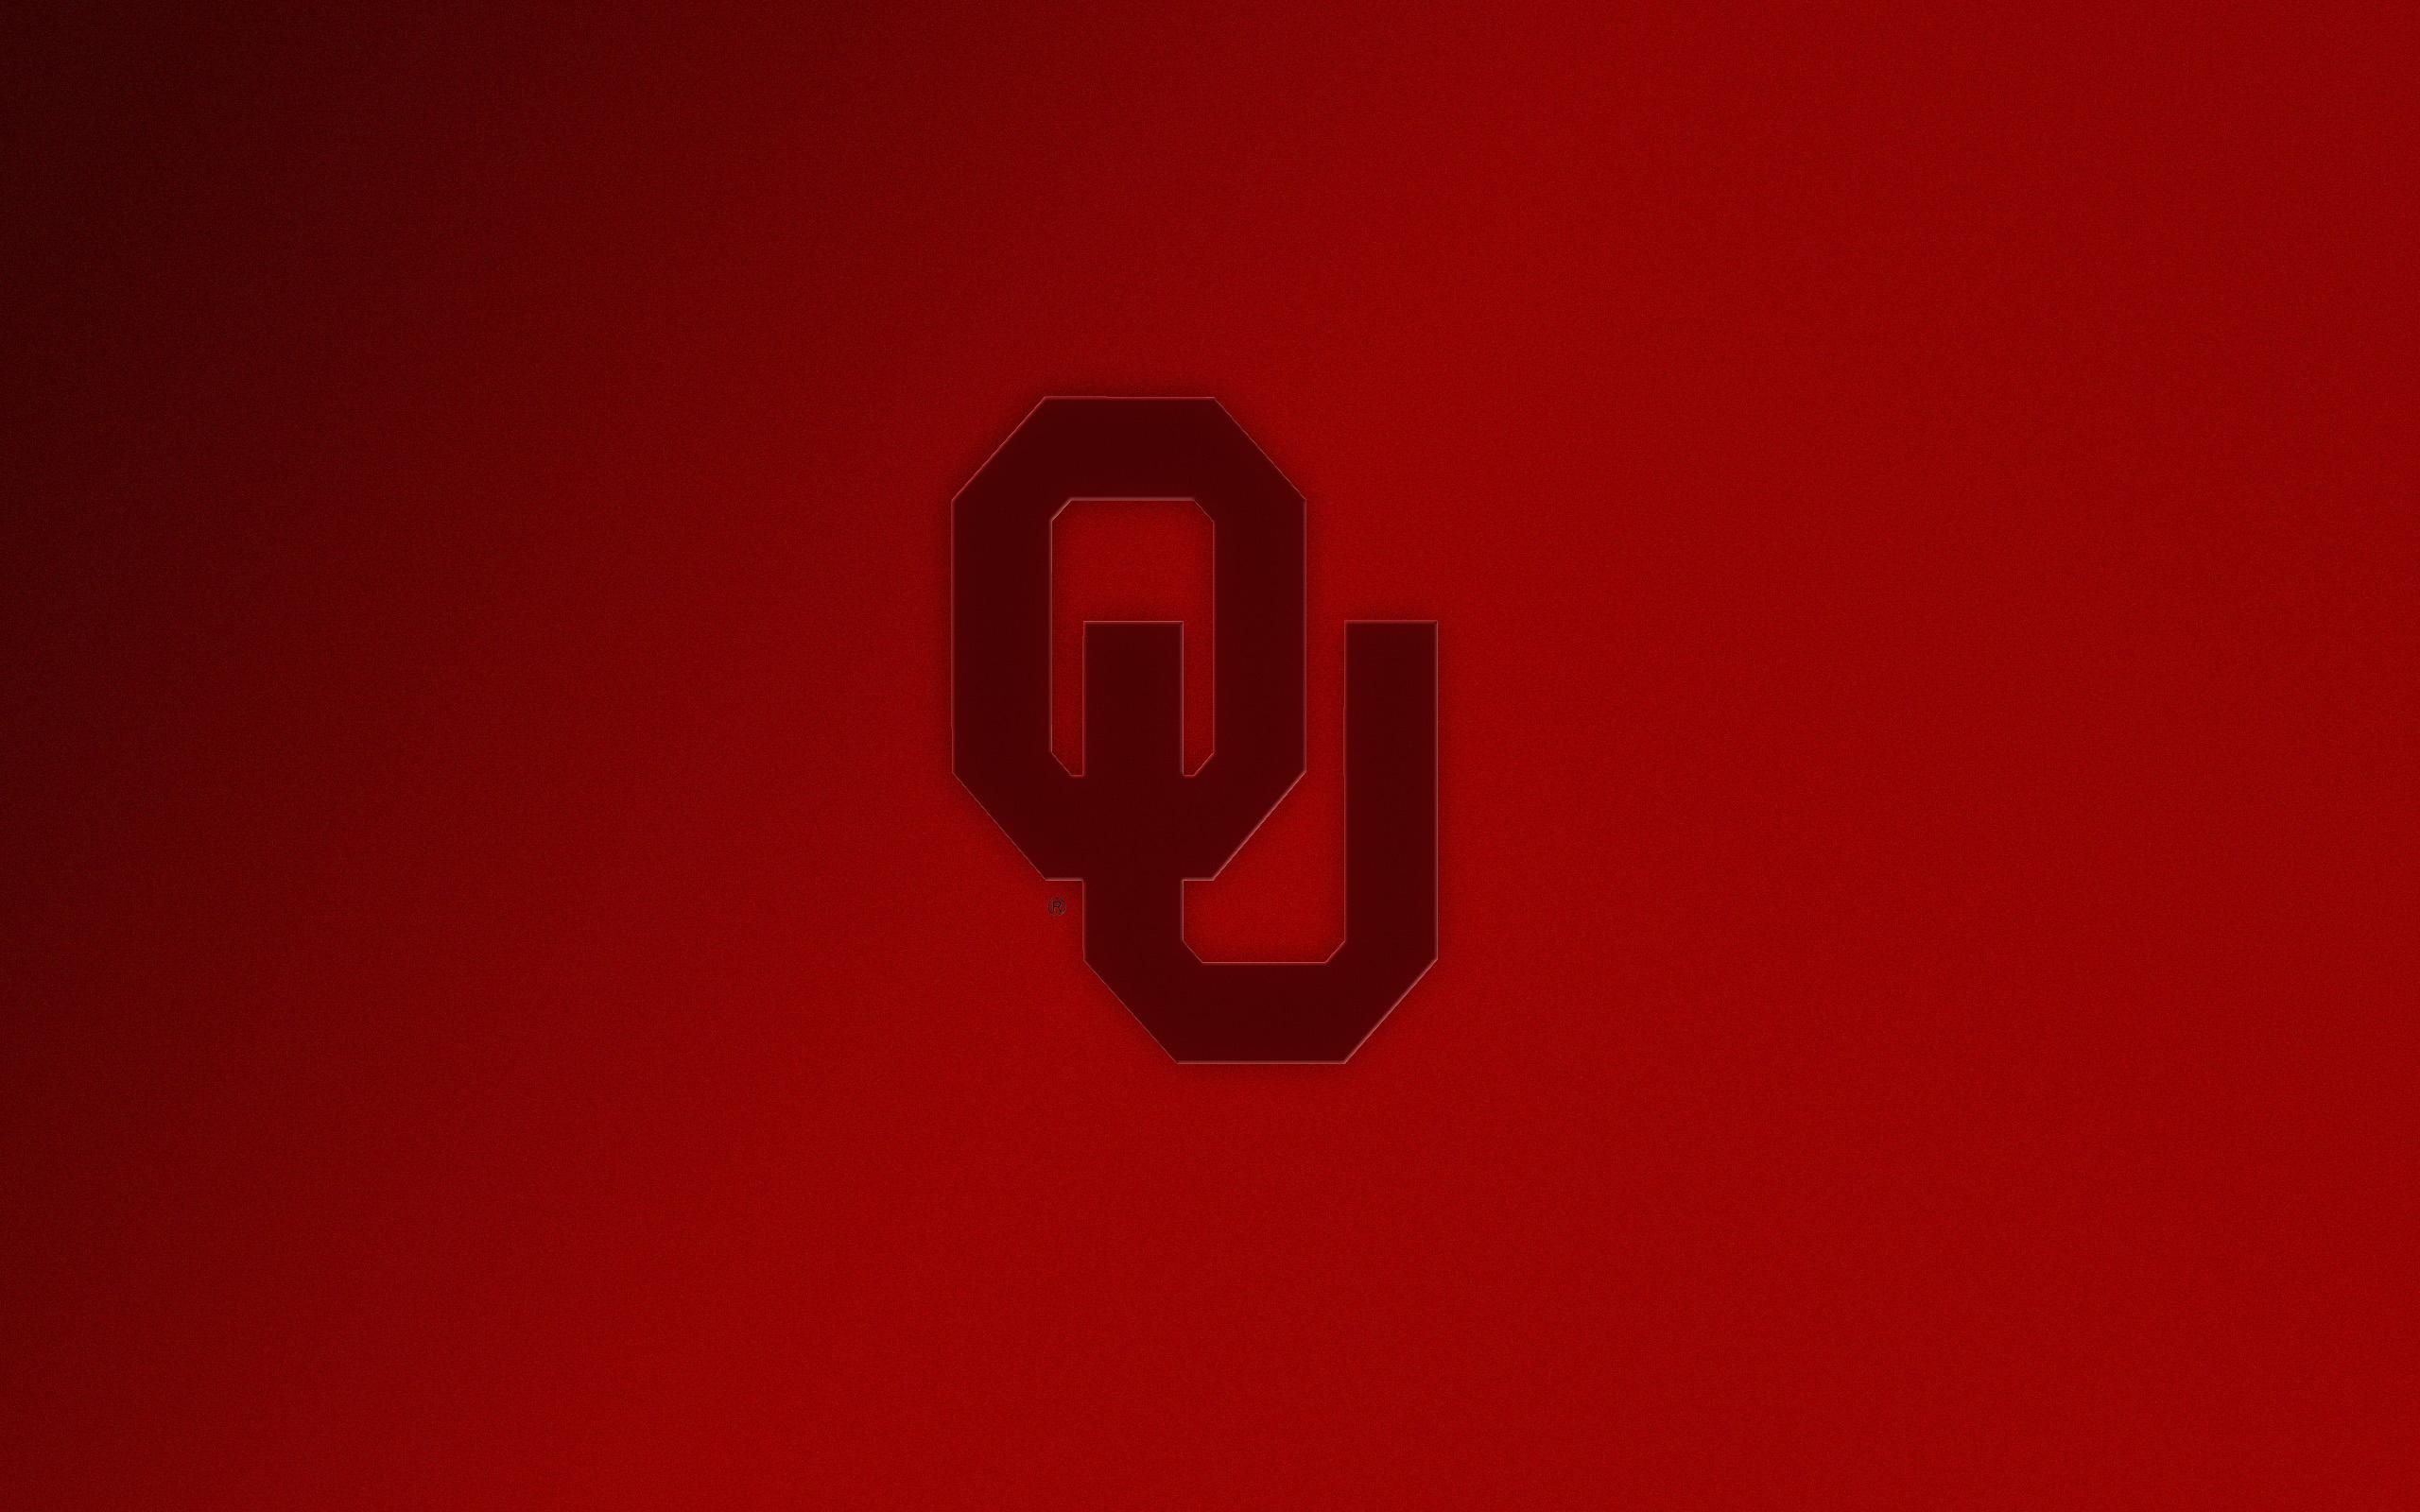 oklahoma university by numblock on ipadforums net download 1024 x http ...